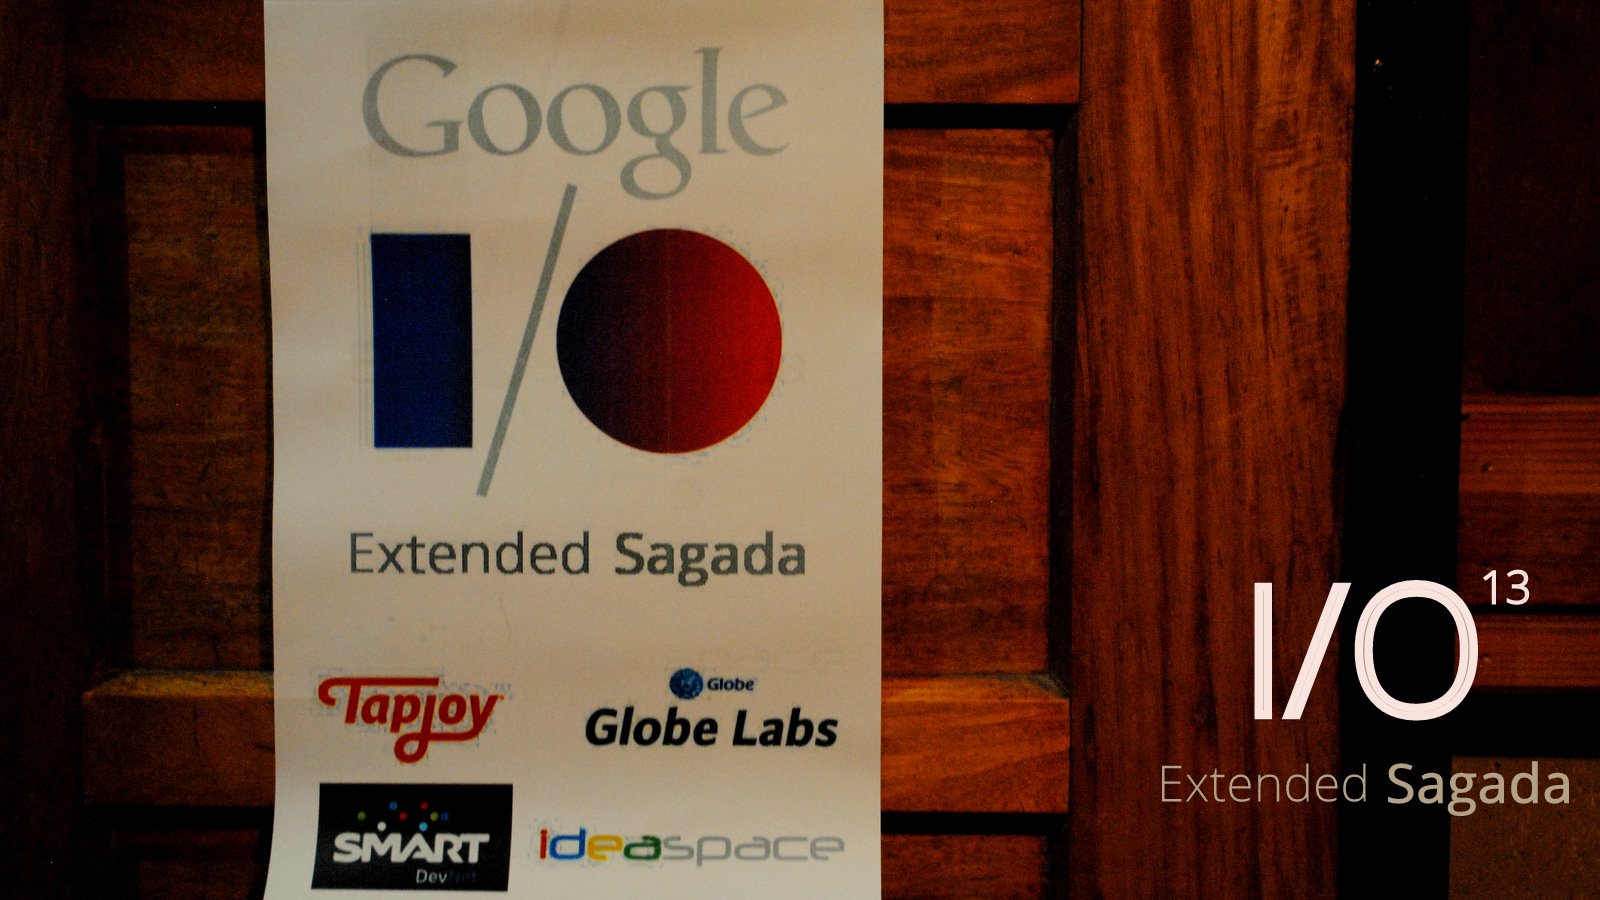 Google I/O Extended Sagada (Philippines) 1708